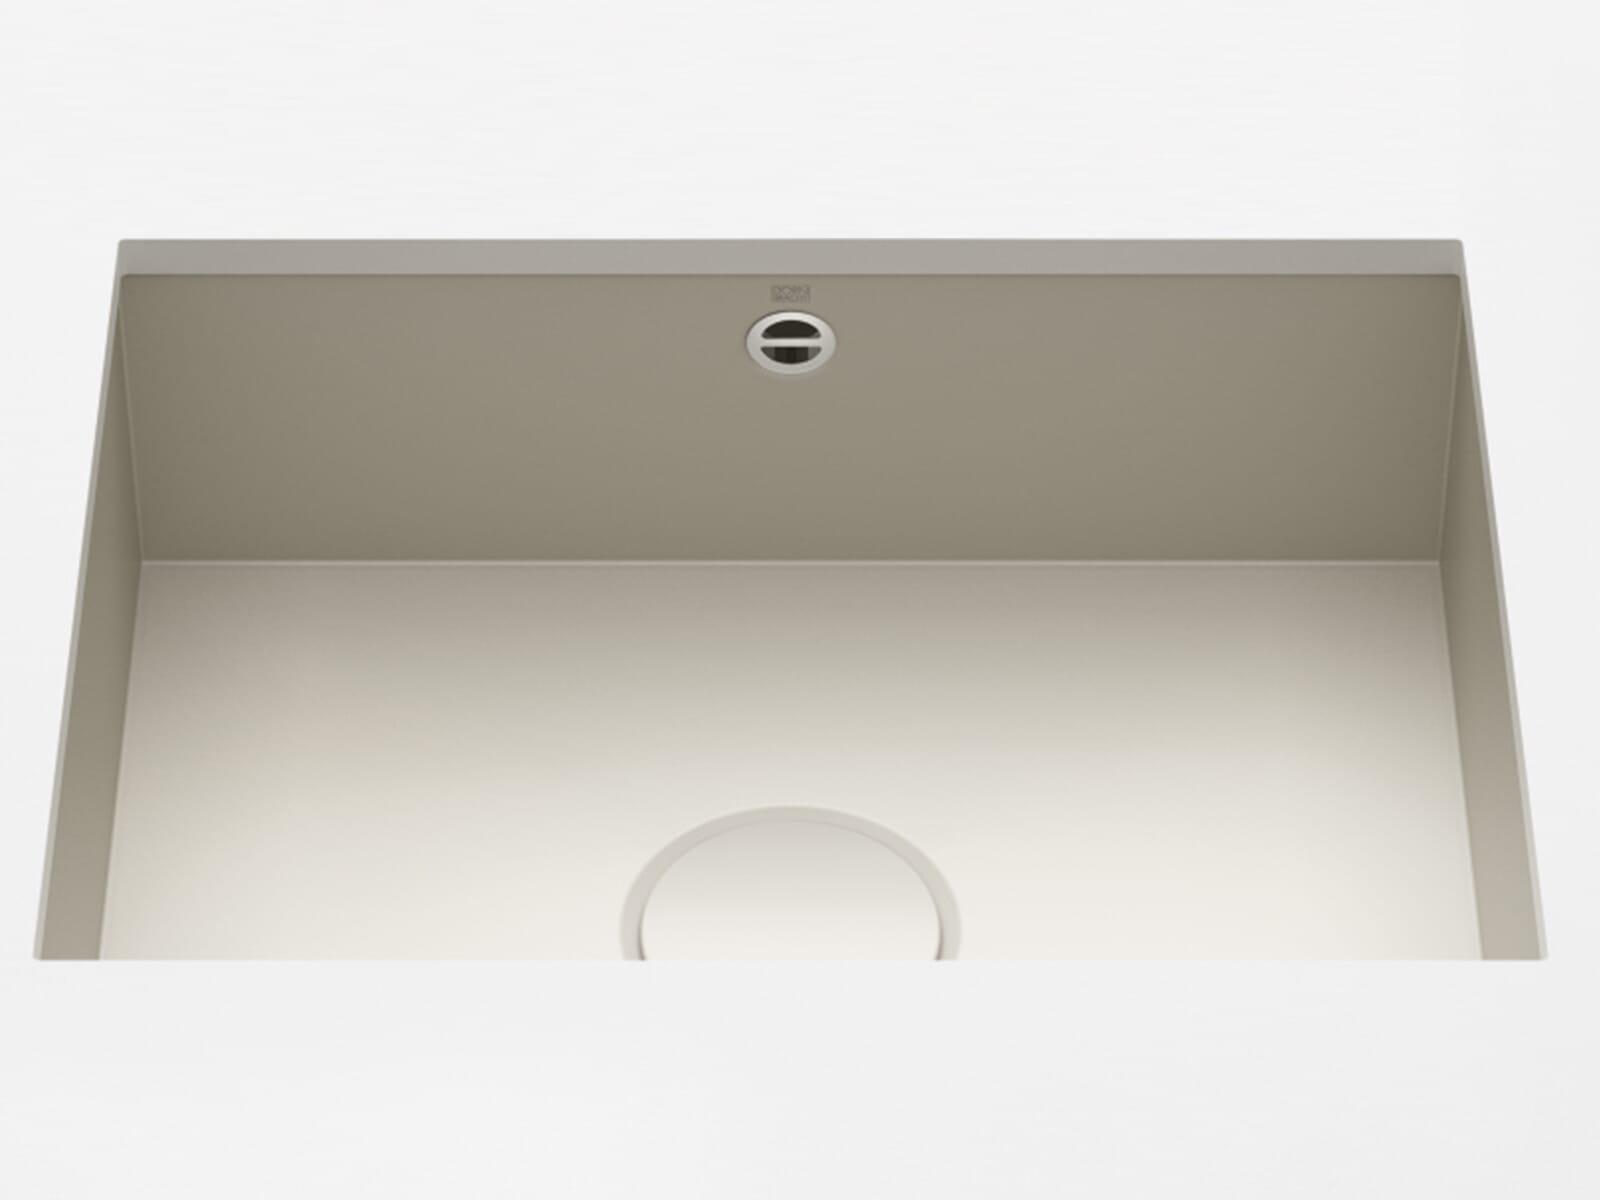 Dornbracht Unterbau-Spüle Glasierter Stahl Sand Matt 38550002-72